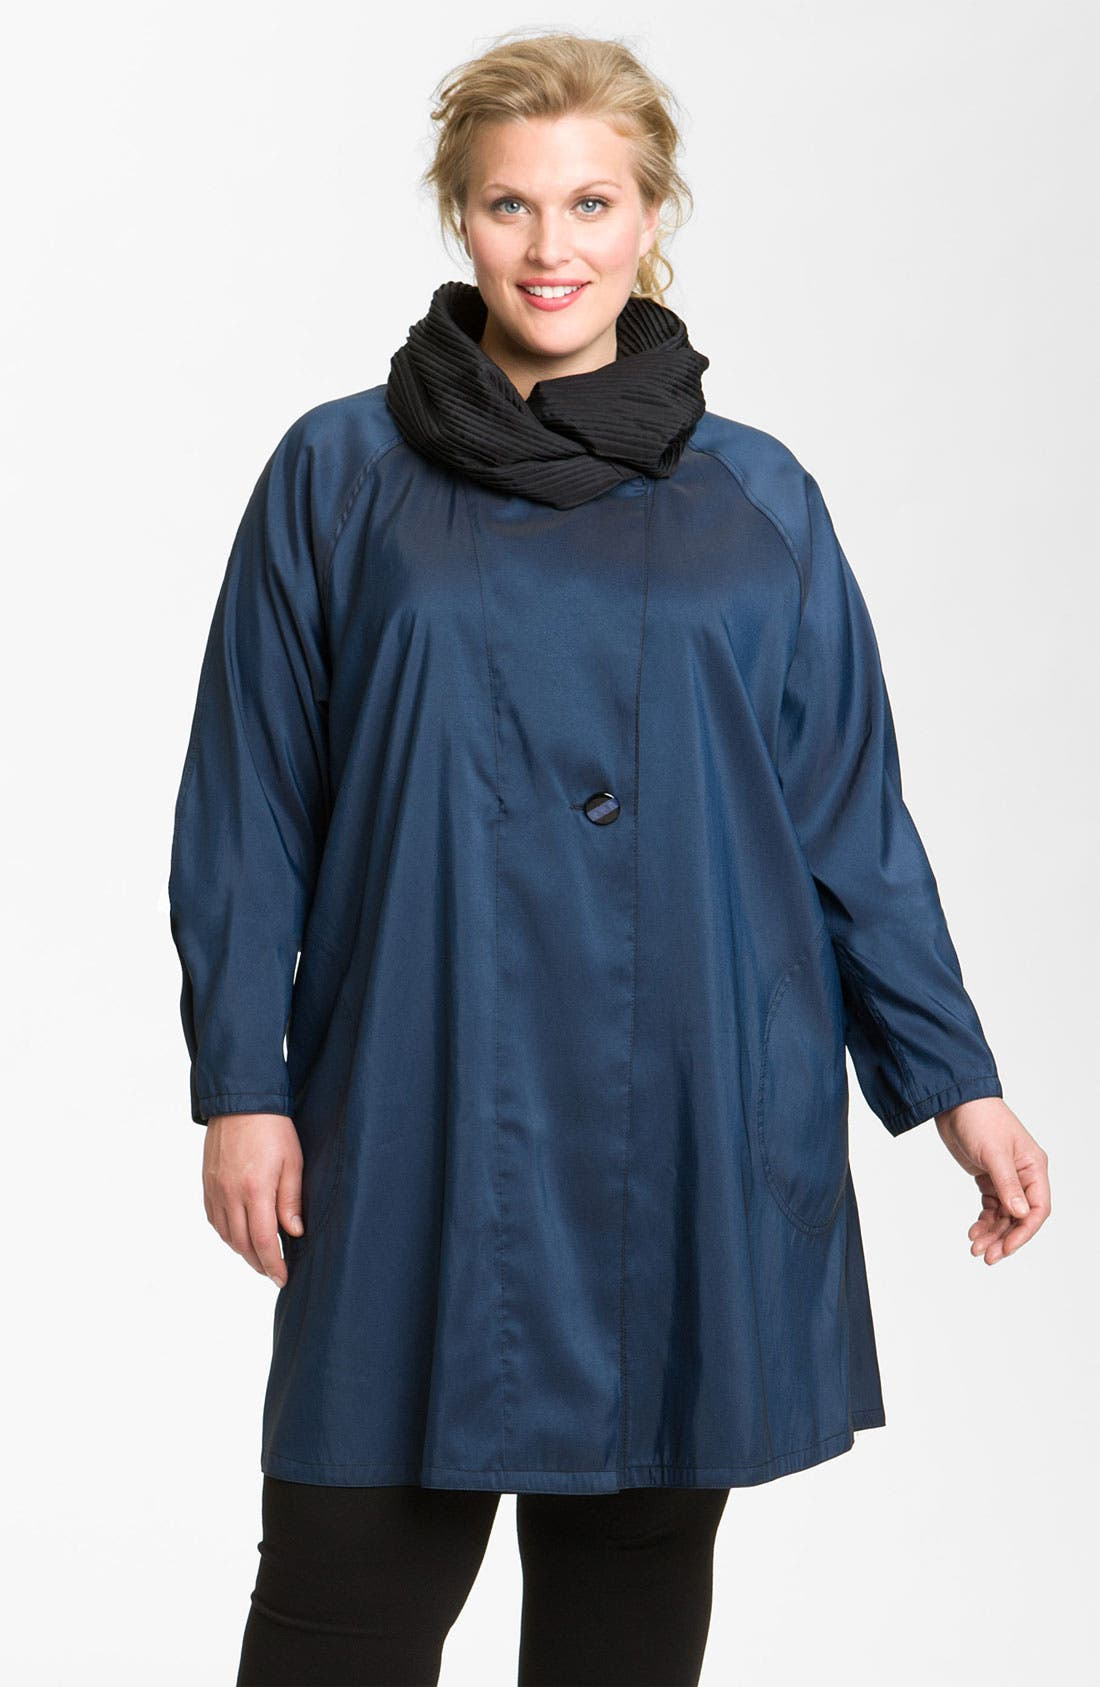 Alternate Image 1 Selected - Mycra Pac Designer Wear Reversible Pleat Hood Packable Travel Coat (Plus Size)